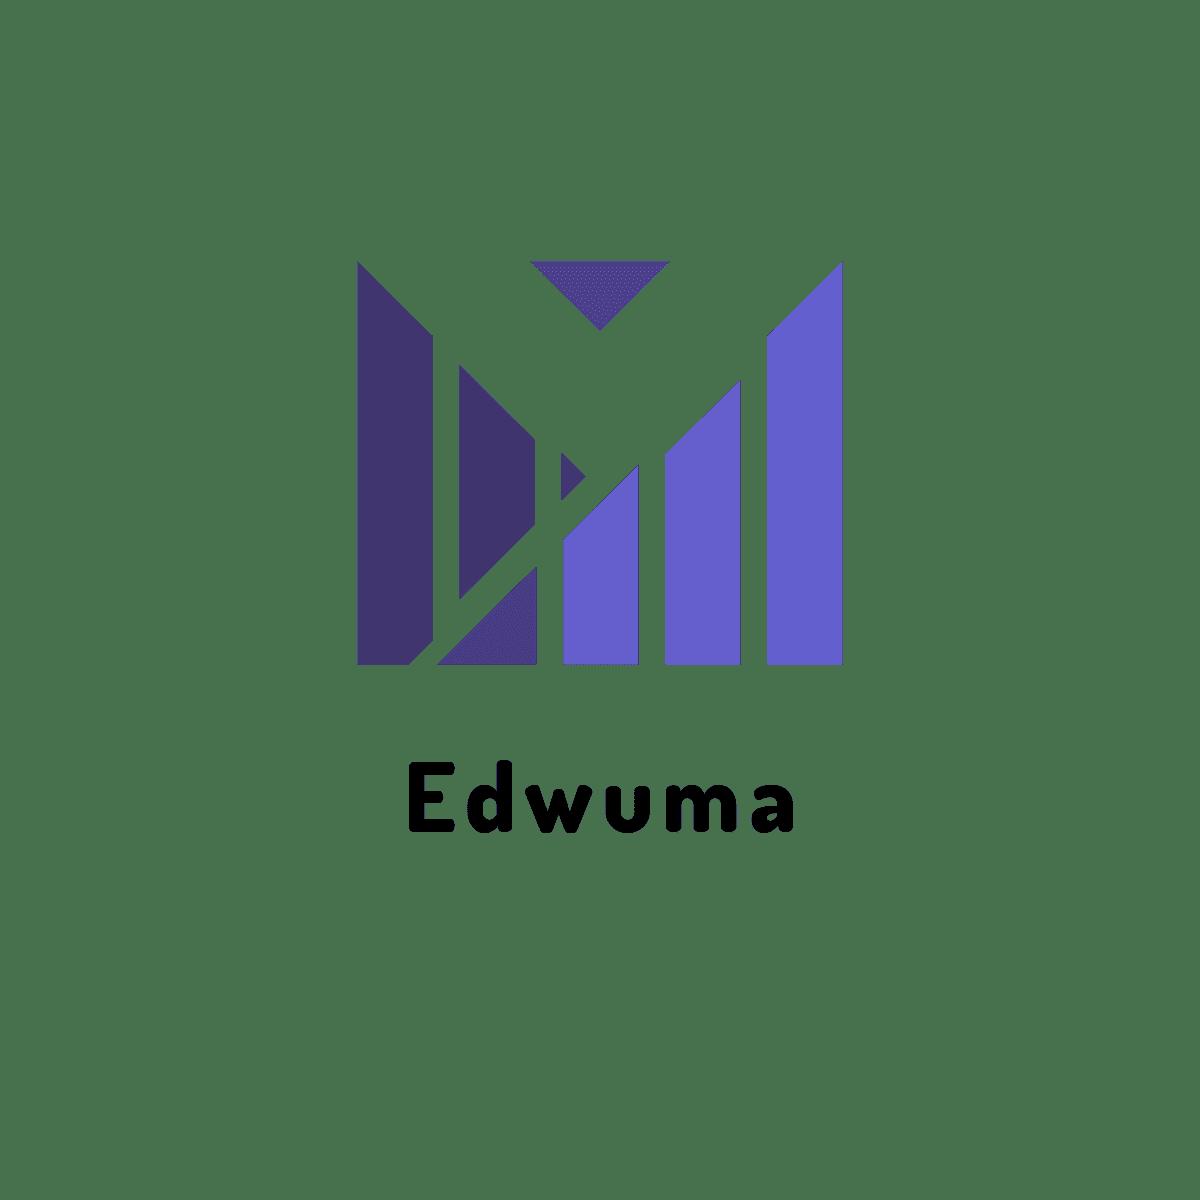 edwuma logo